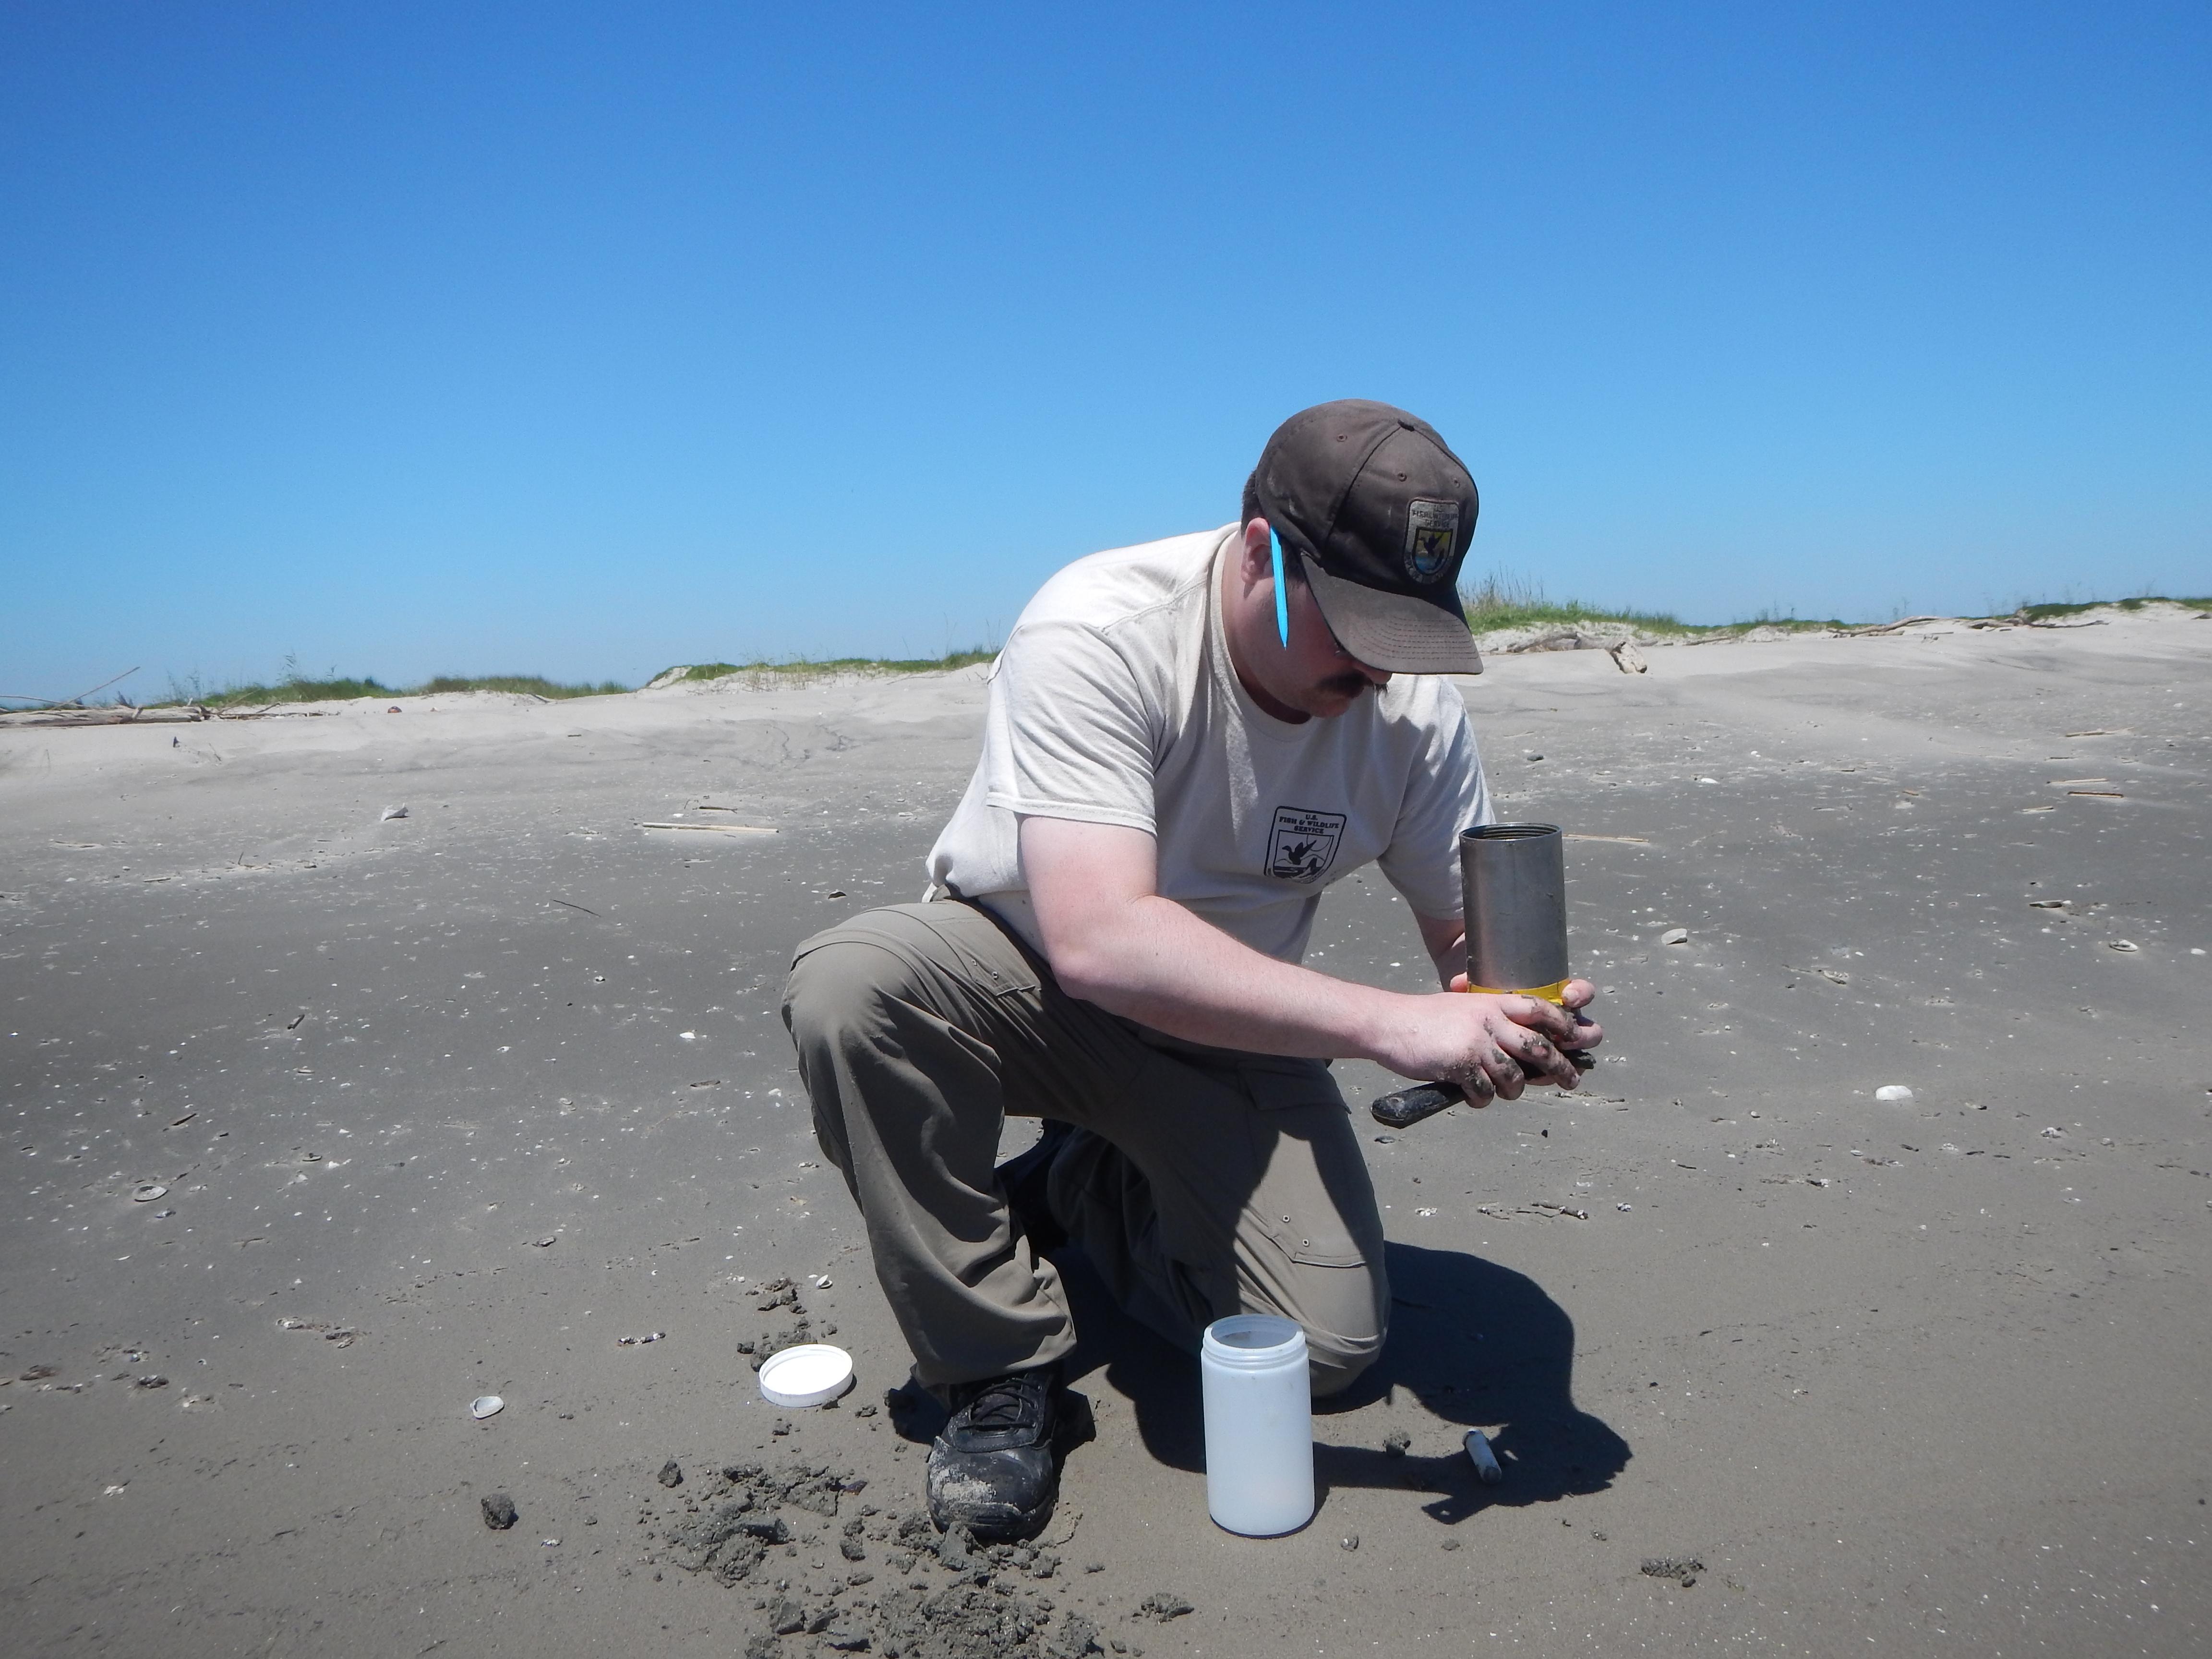 A USFWS biologist takes samples of sand at North Breton Island.